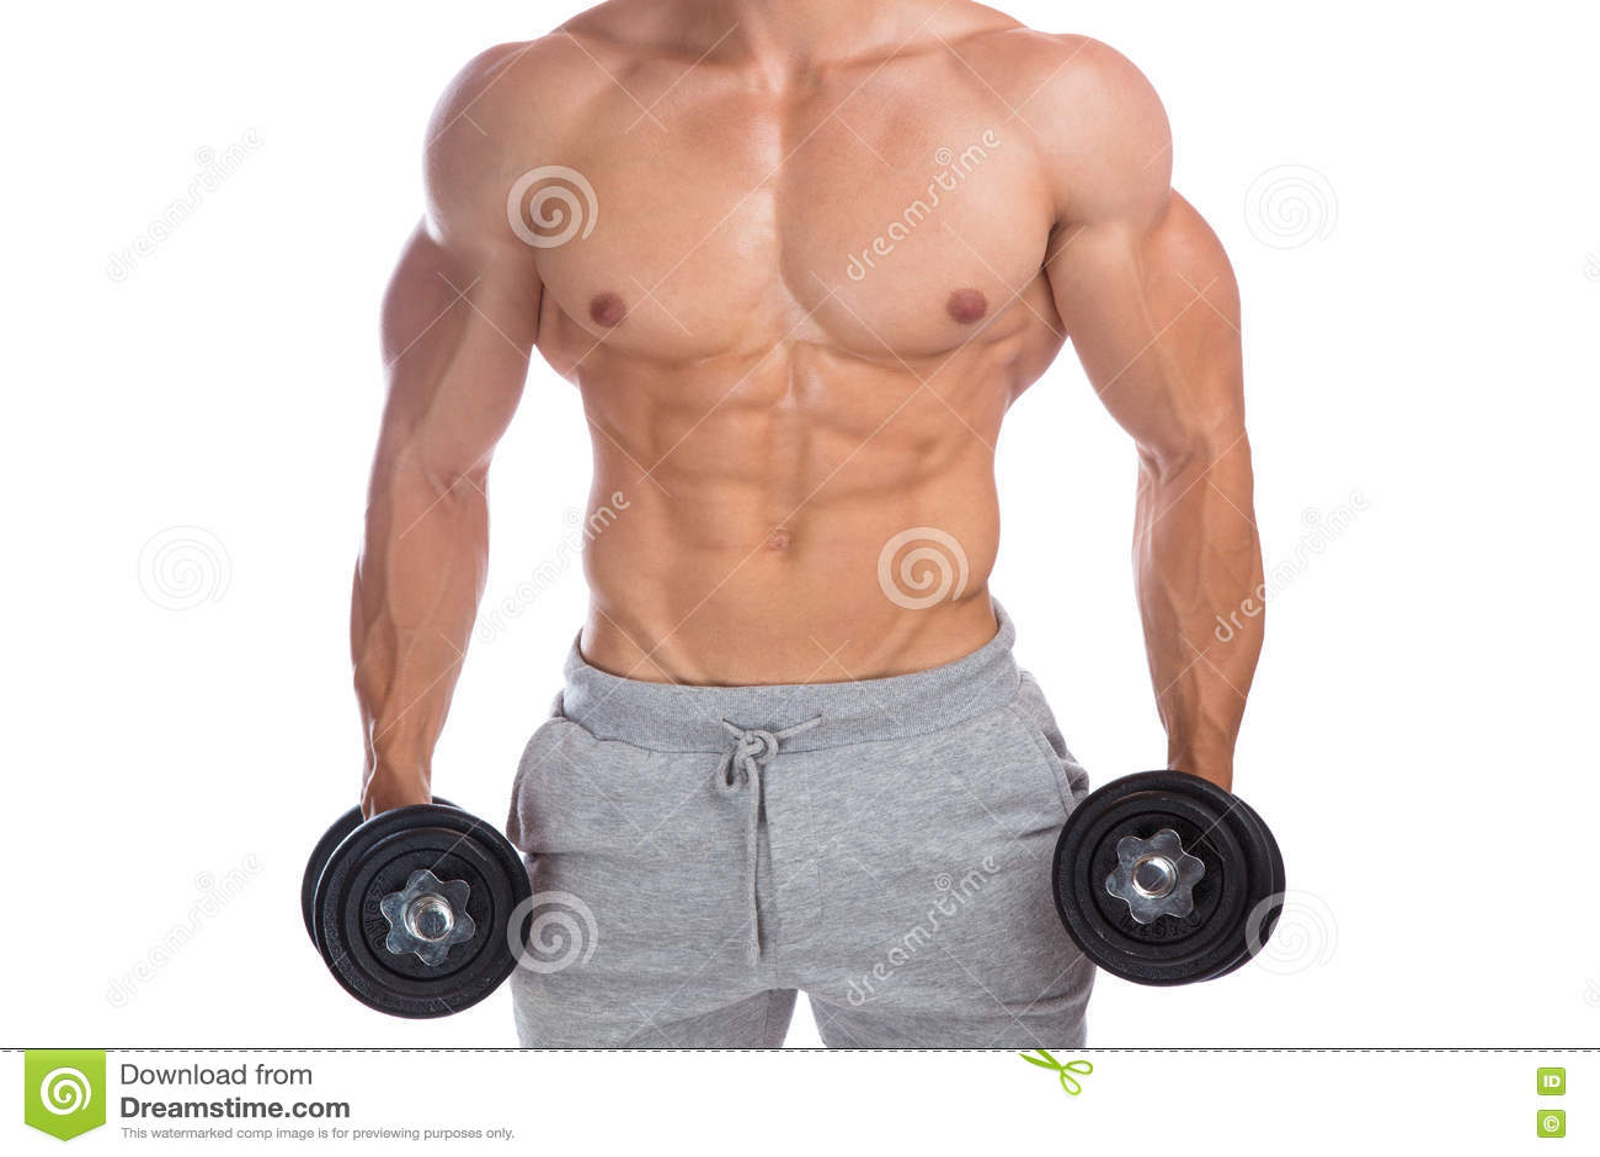 Bodybuilder Bodybuilding Muscles Upper Body Strong Muscular Man